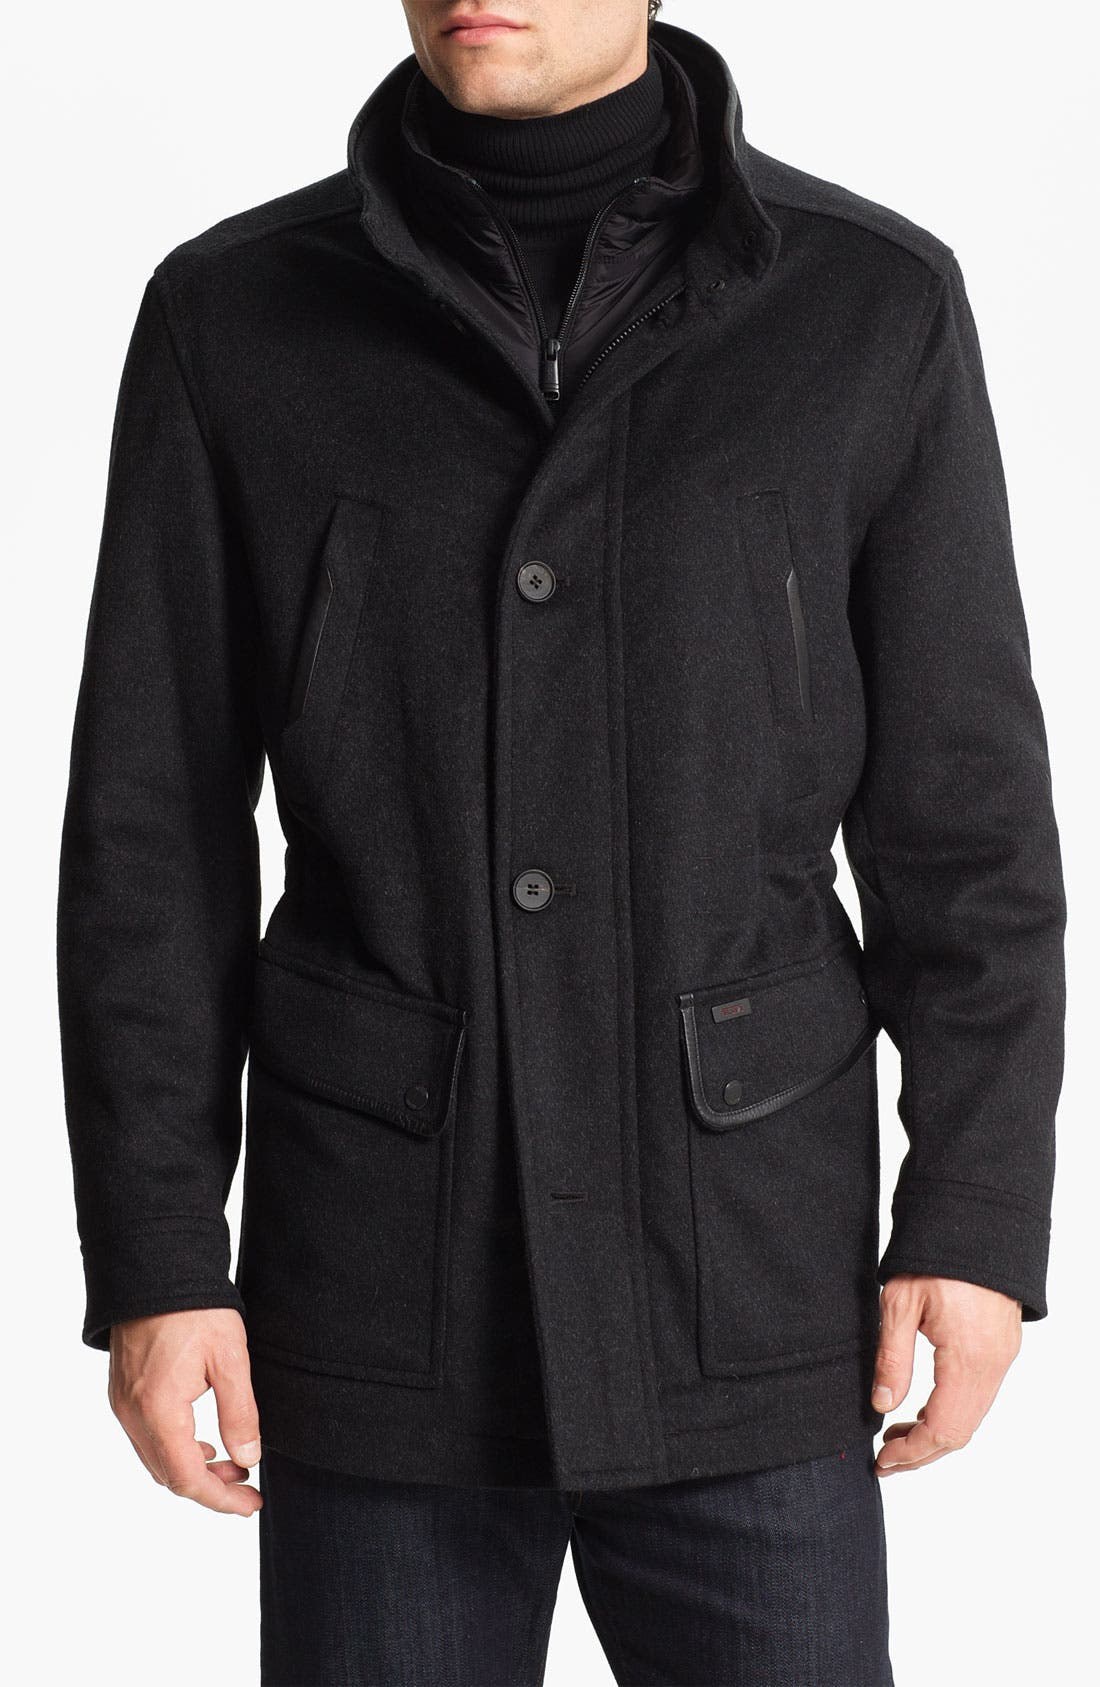 Alternate Image 1 Selected - Tumi Wool & Cashmere Blend Car Coat